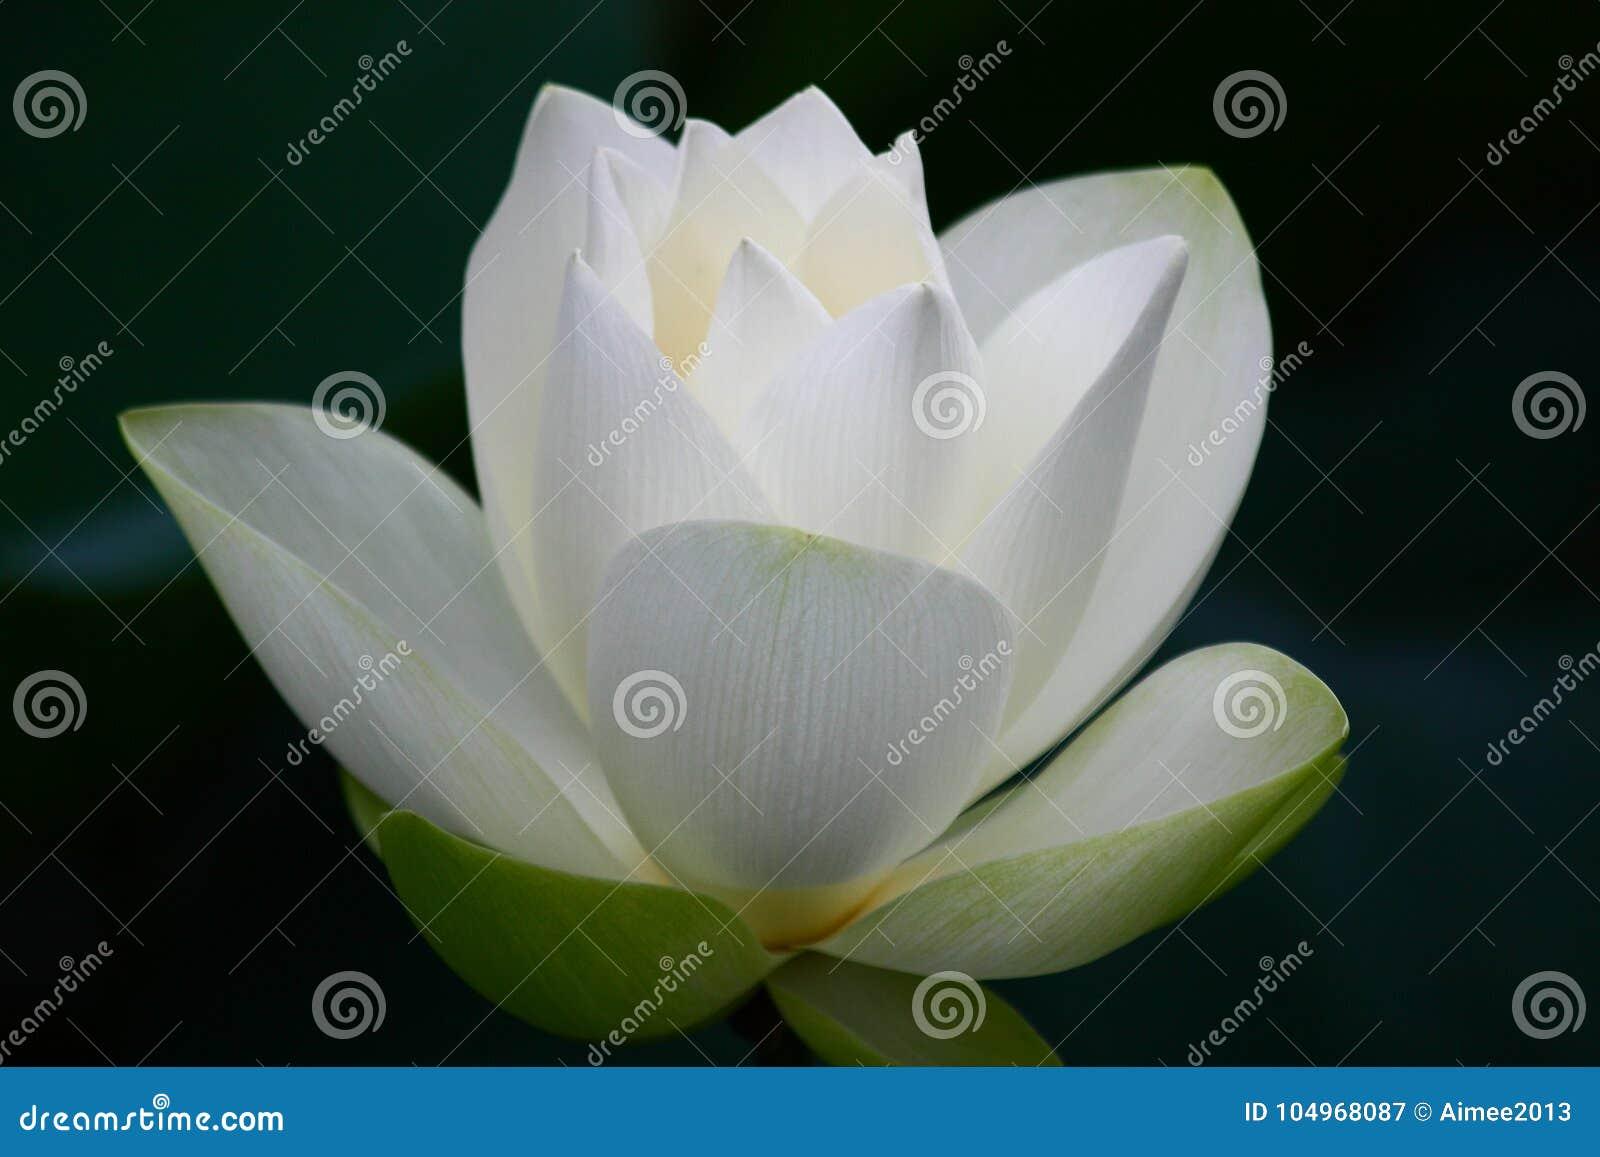 Flor de lótus brancos